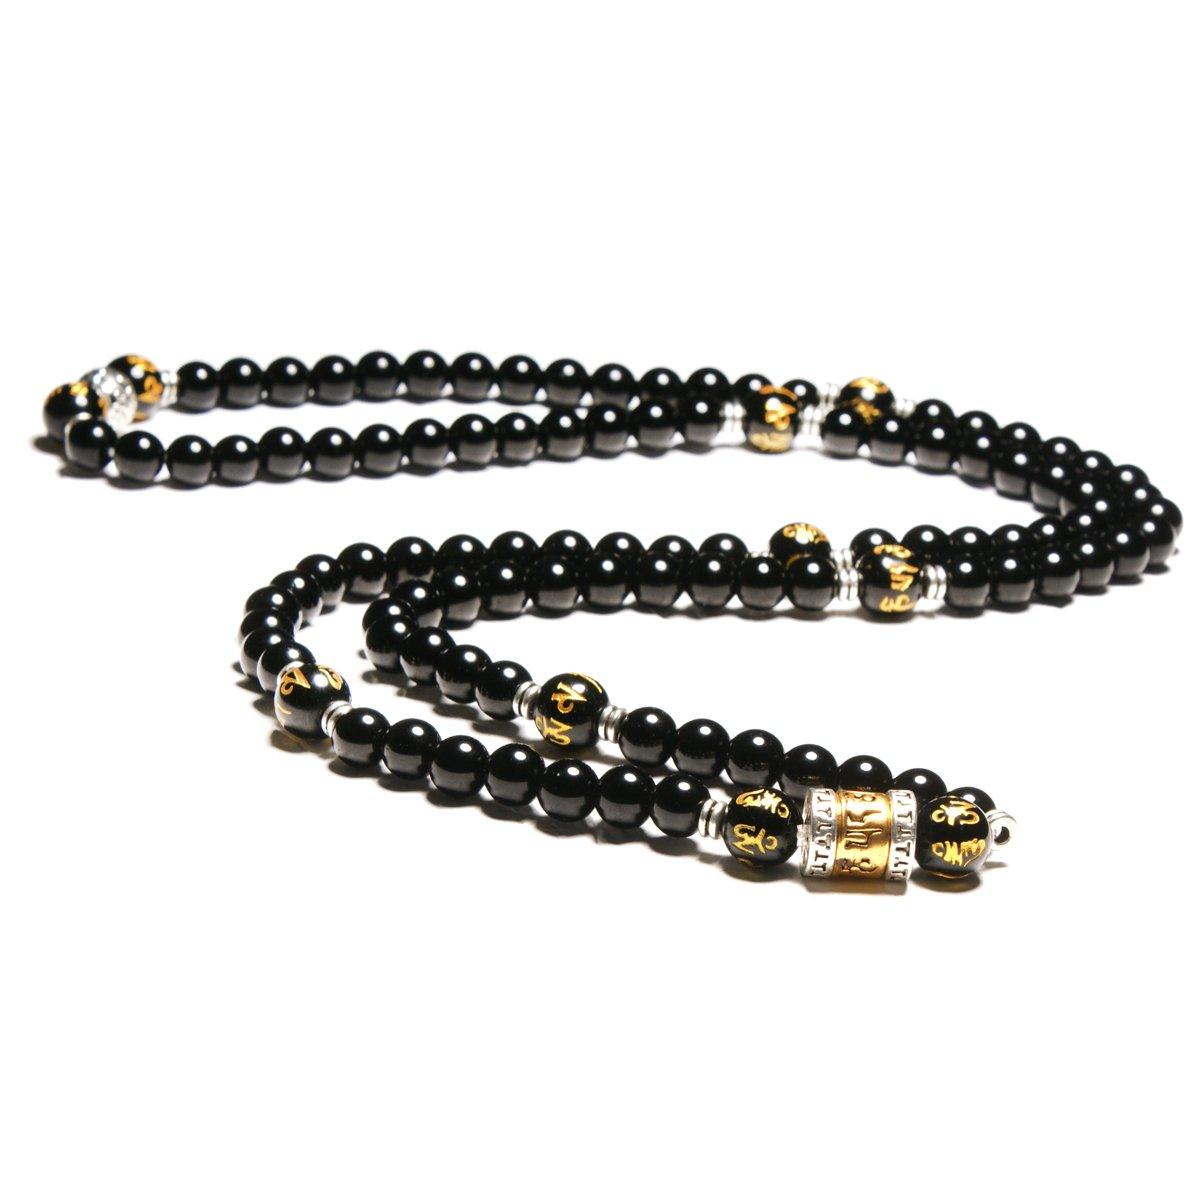 MOON GIRL Buddha 108 Mala Beads Prayer Bracelet Femme Yoga Scripture Chakra Pulseras Hombre